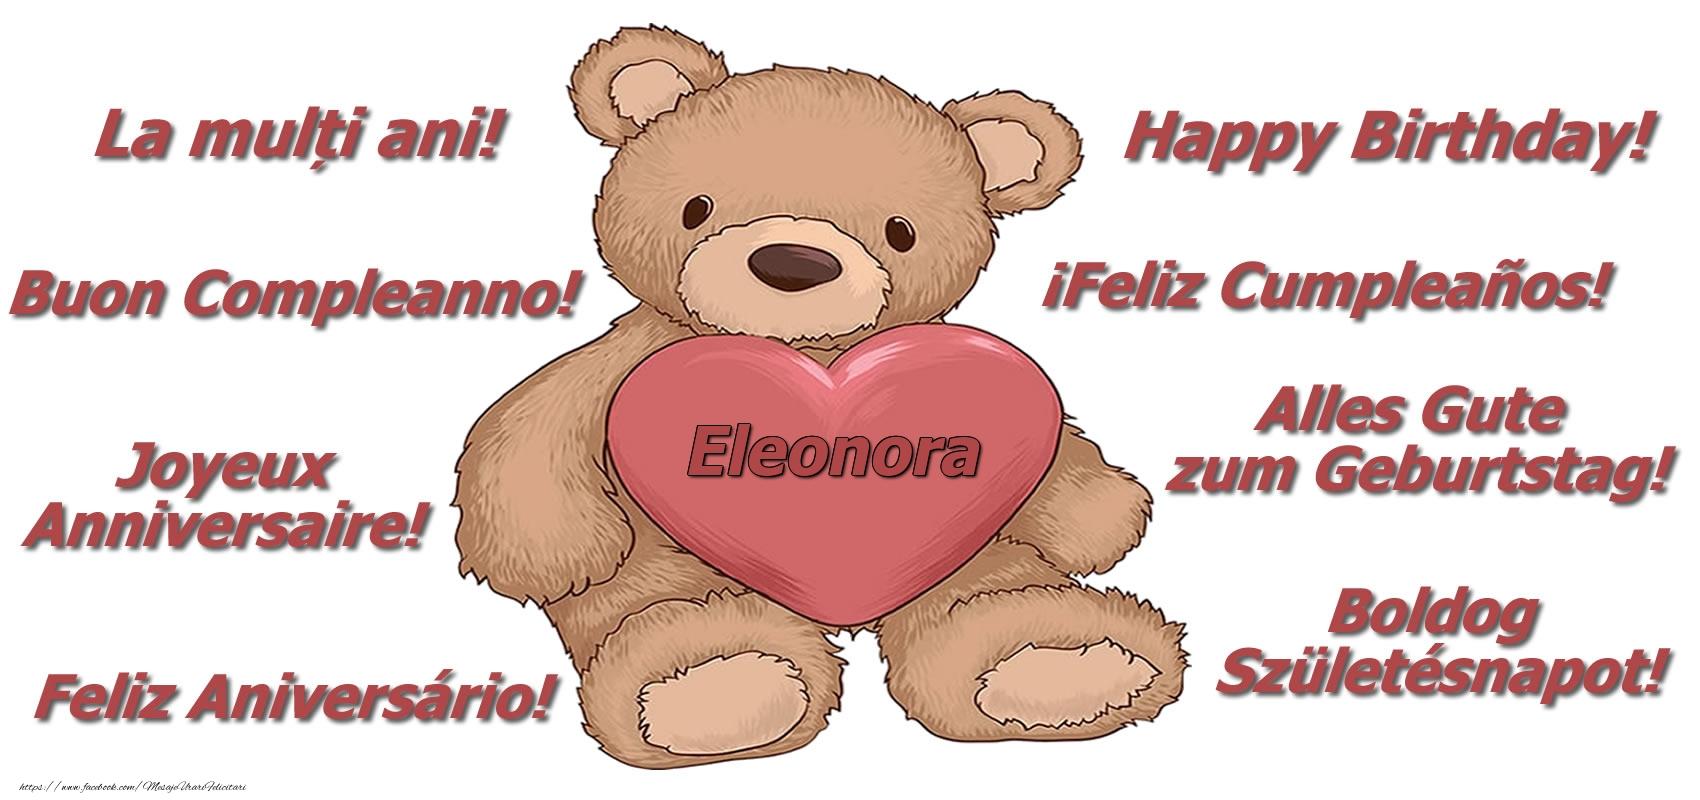 Felicitari de zi de nastere - La multi ani Eleonora! - Ursulet